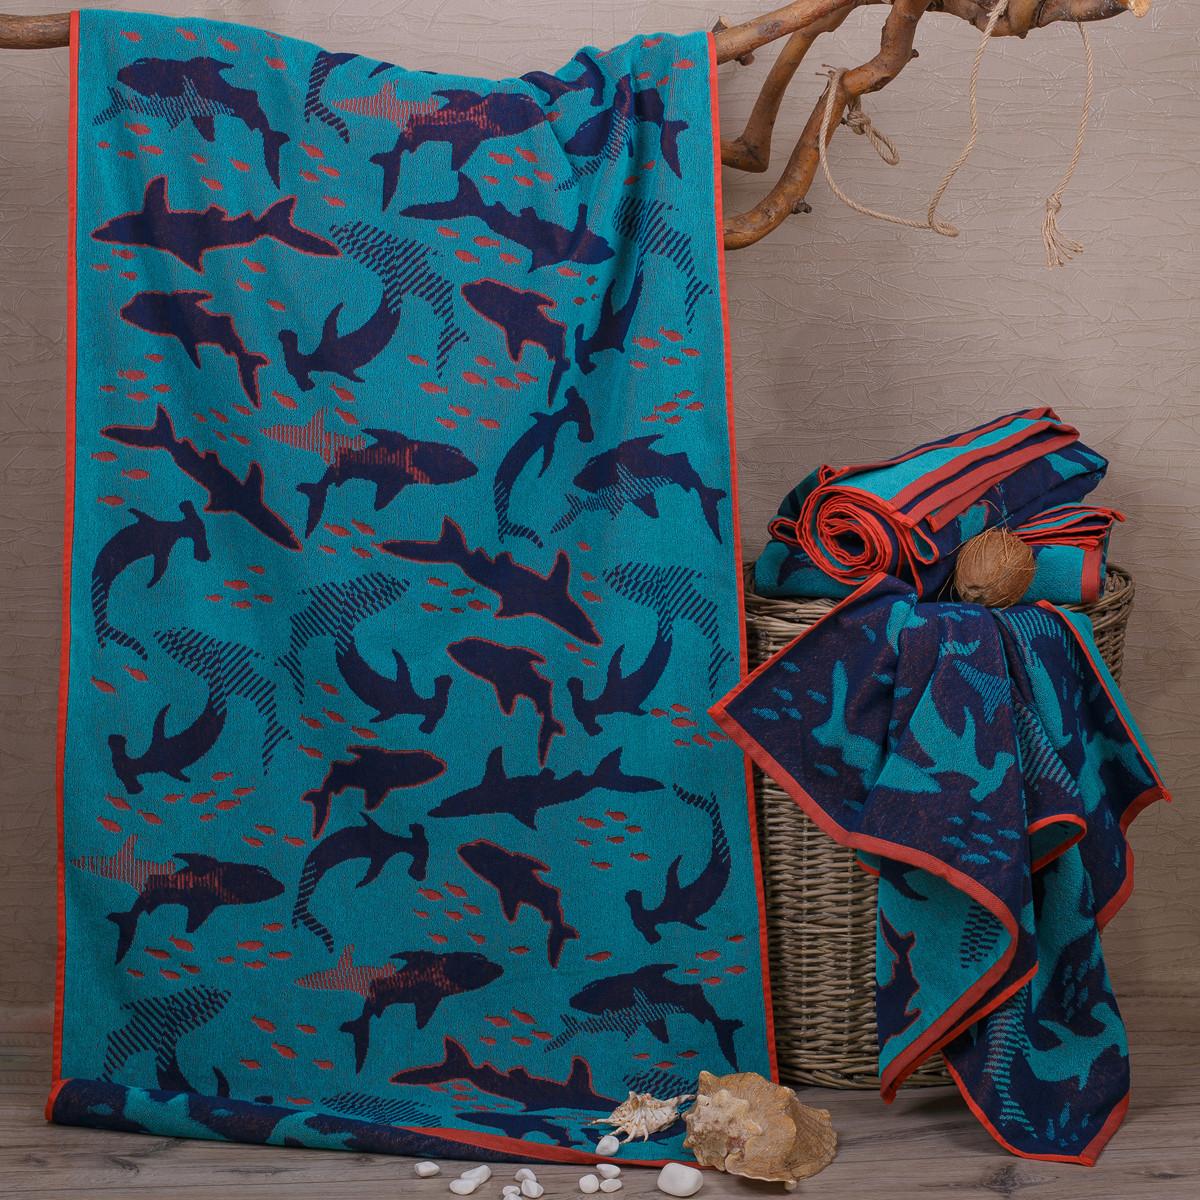 Полотенце махровое ТМ Речицкий текстиль, Ныряй к нам 81х160 см